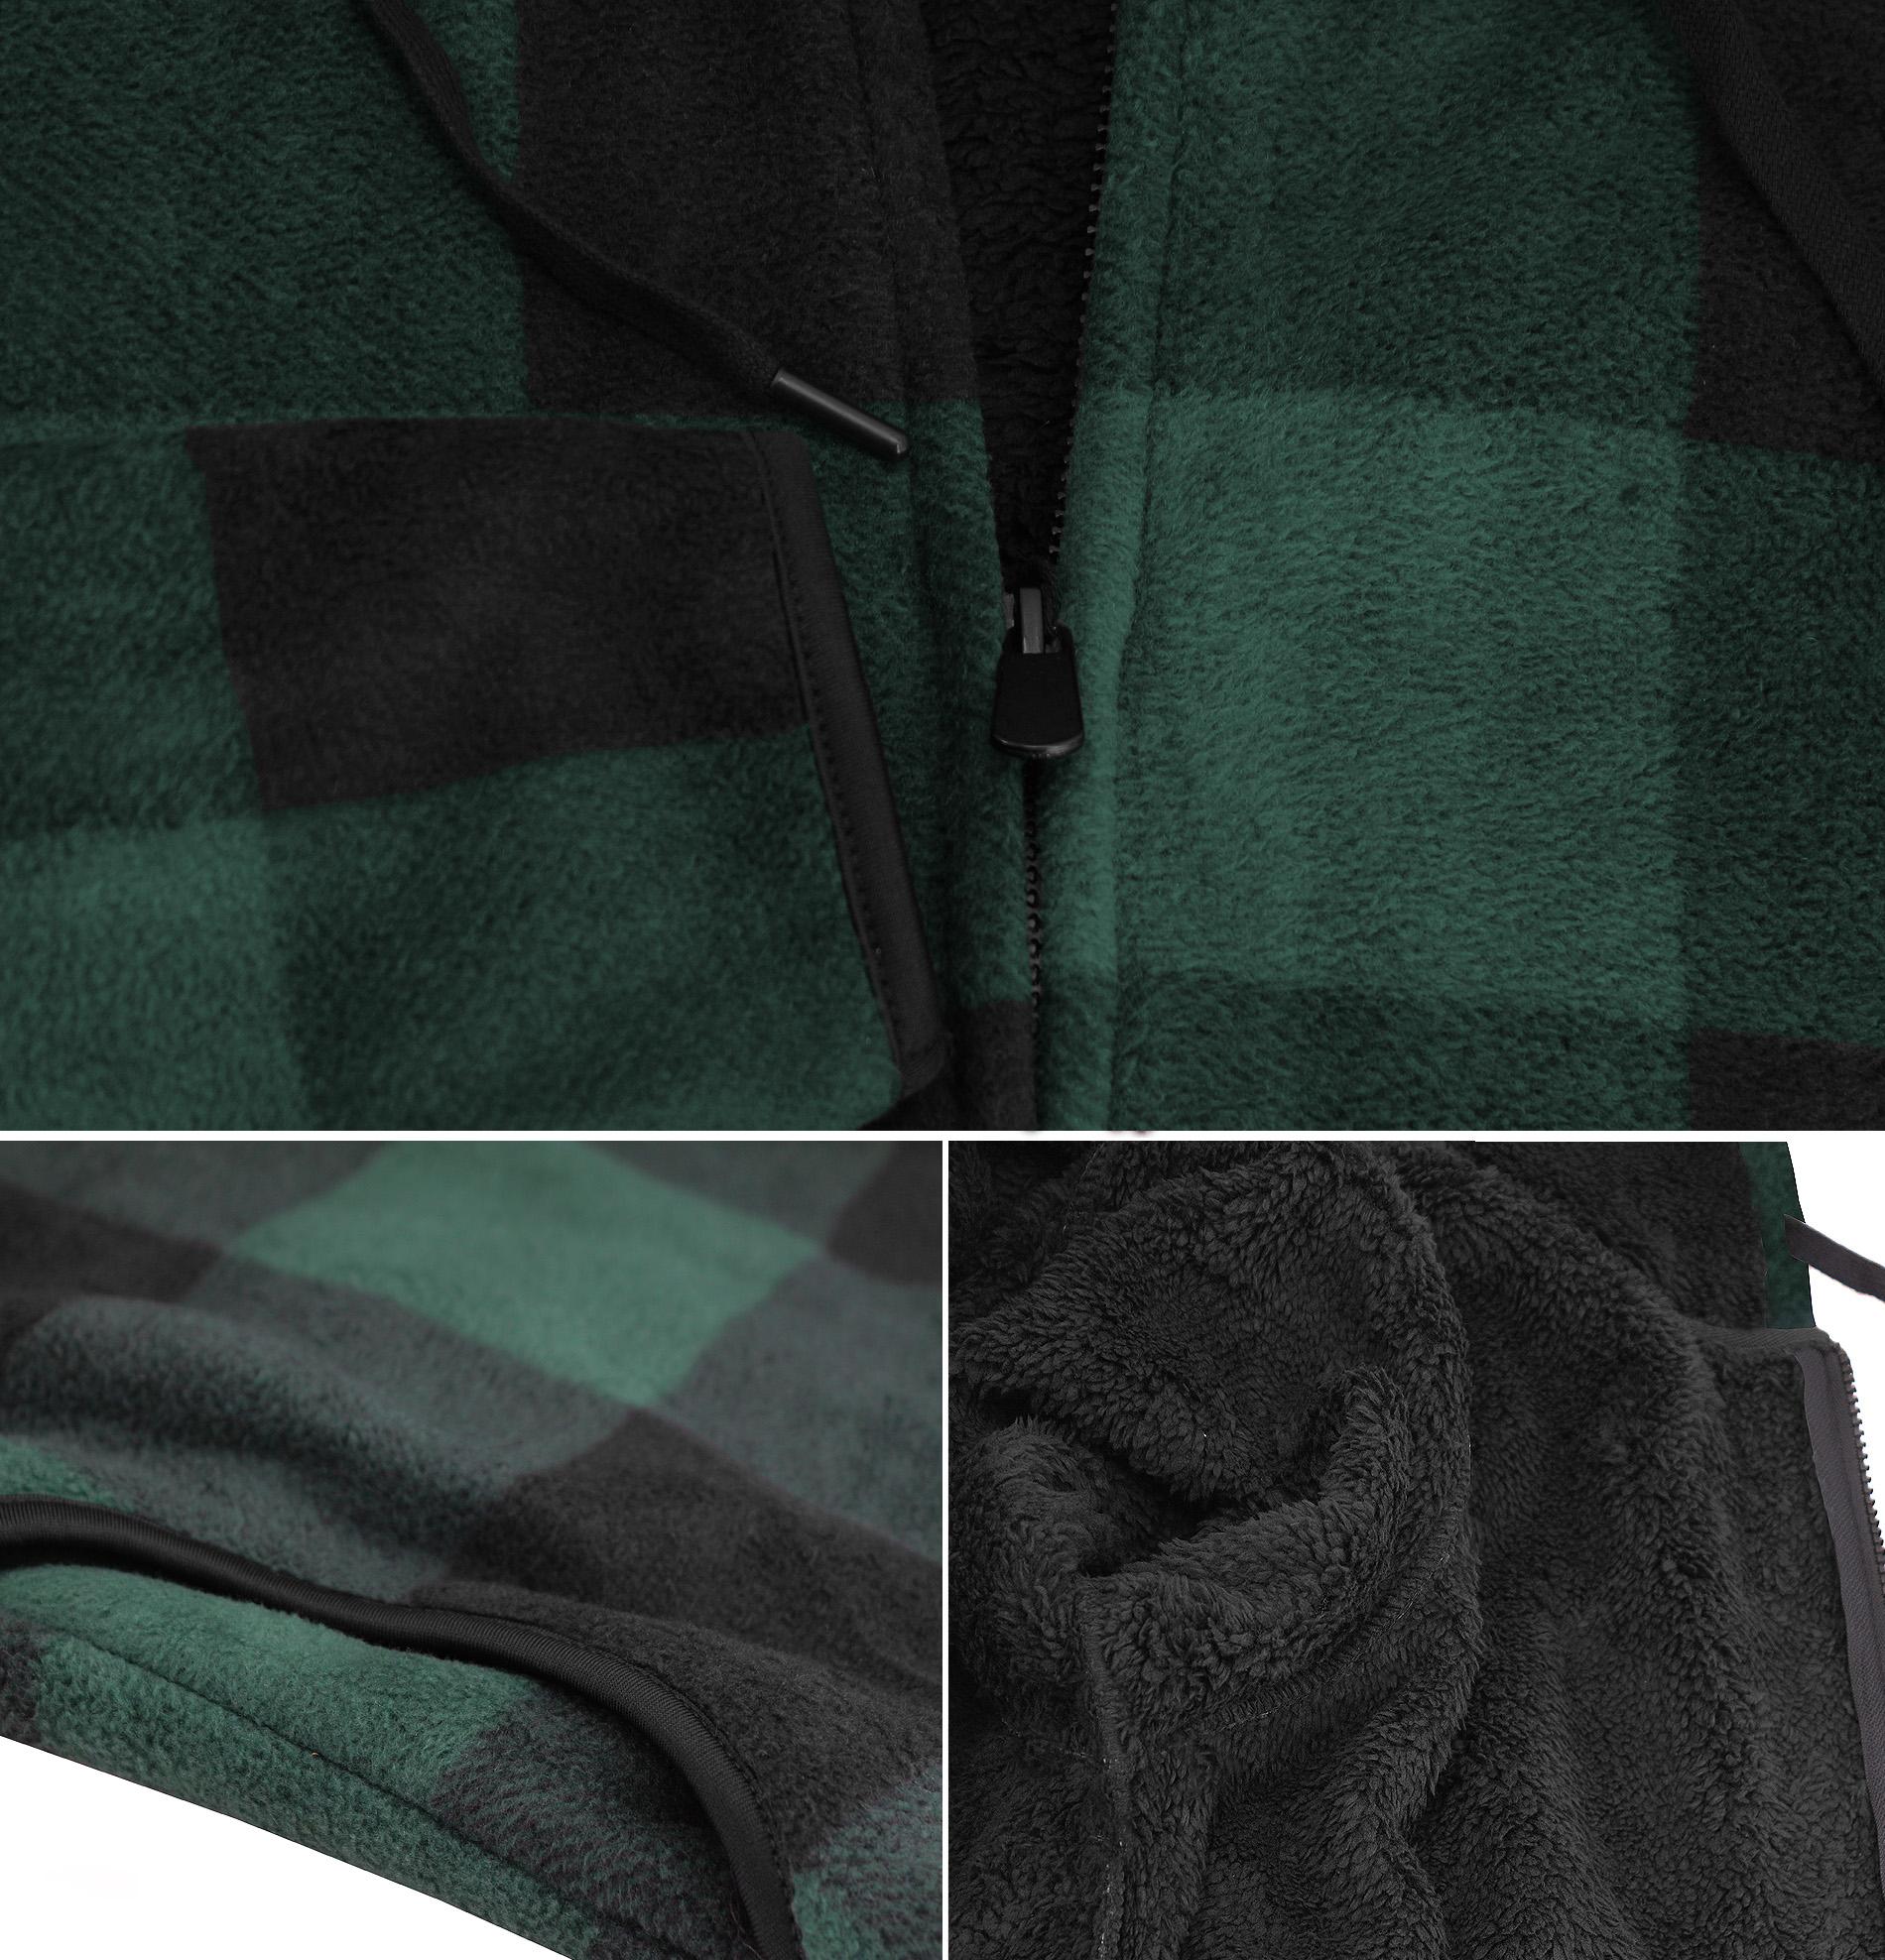 Men-039-s-Casual-Flannel-Zip-Up-Fleece-Lined-Plaid-Sherpa-Hoodie-Lightweight-Jacket thumbnail 7